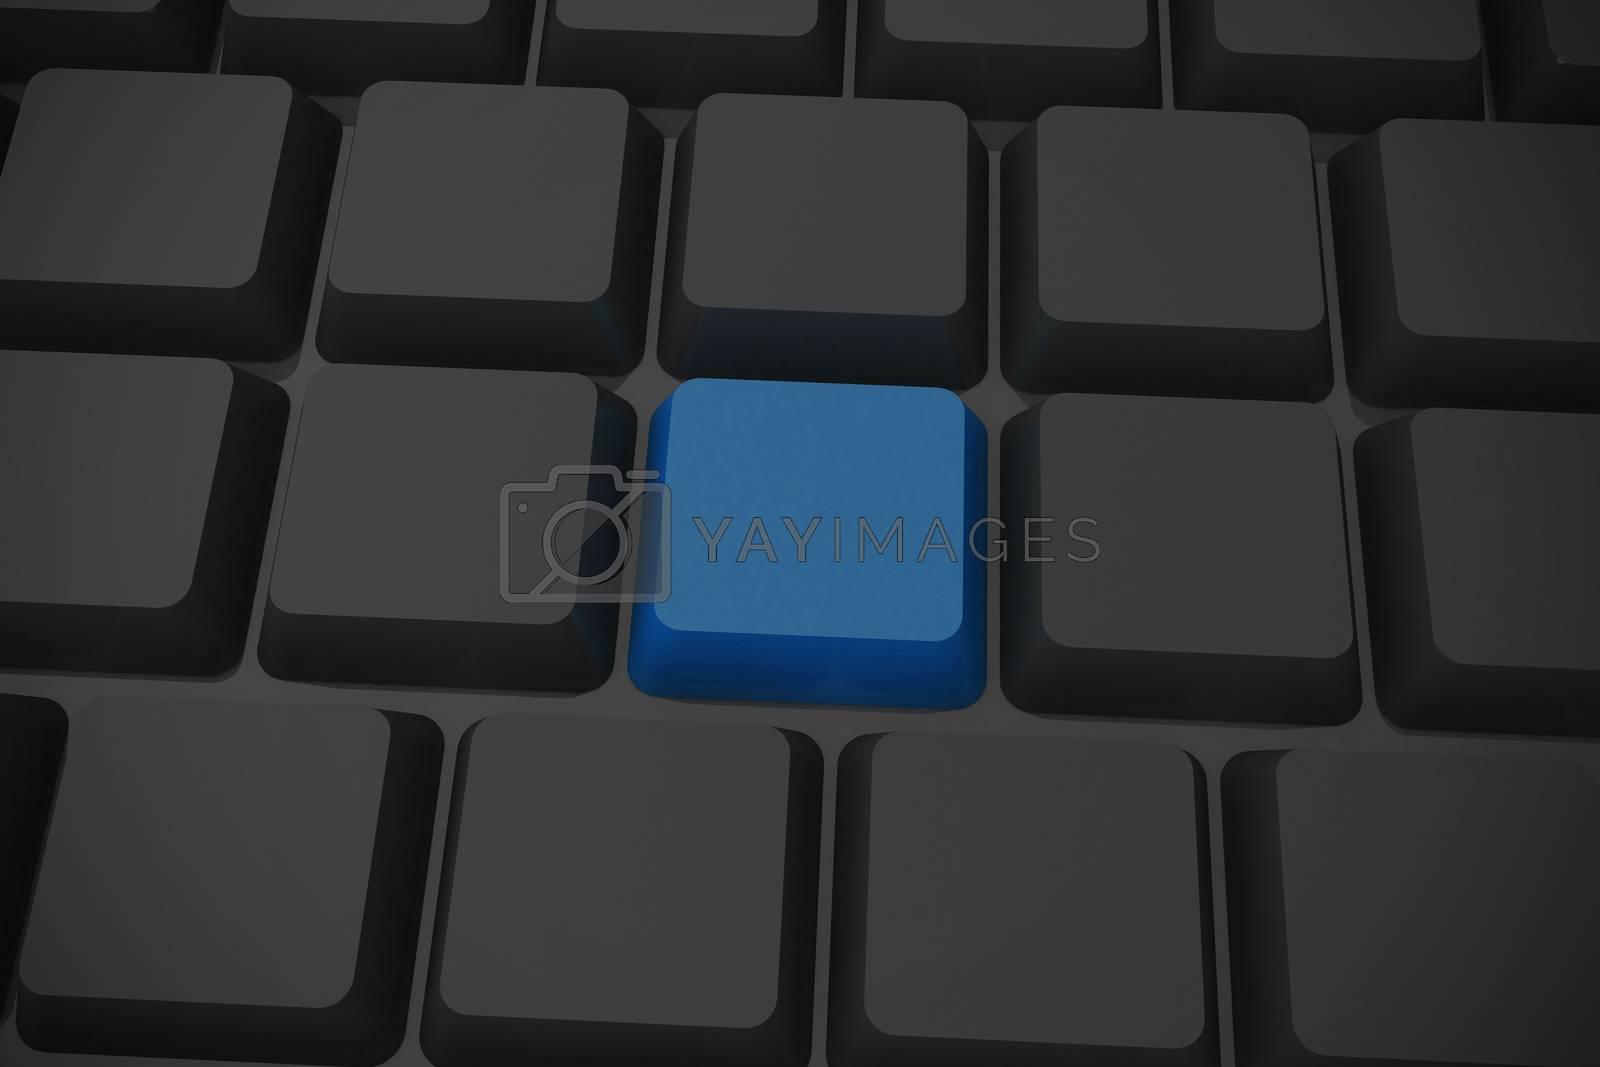 Royalty free image of Black keyboard with blue key by Wavebreakmedia